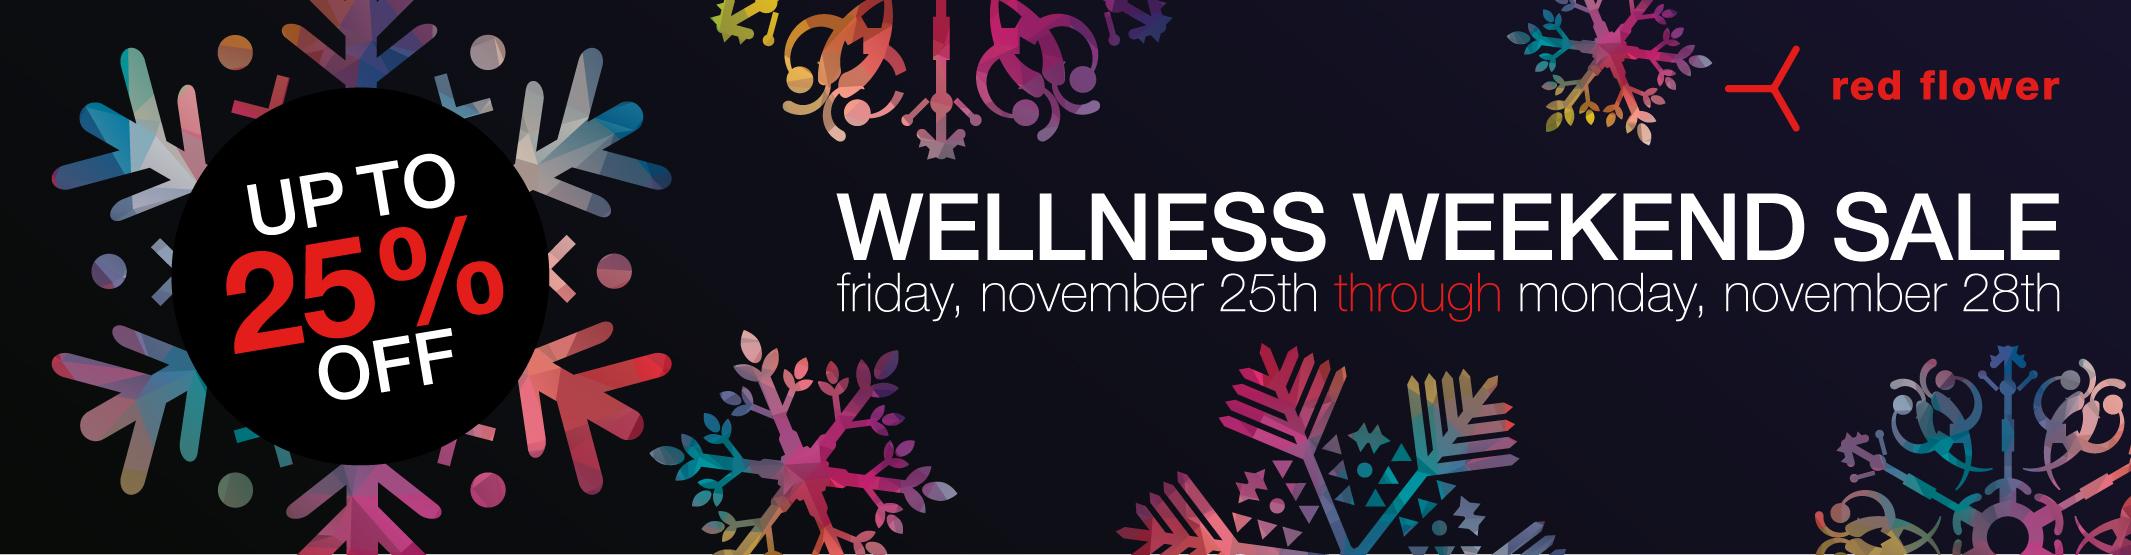 black friday wellness weekend